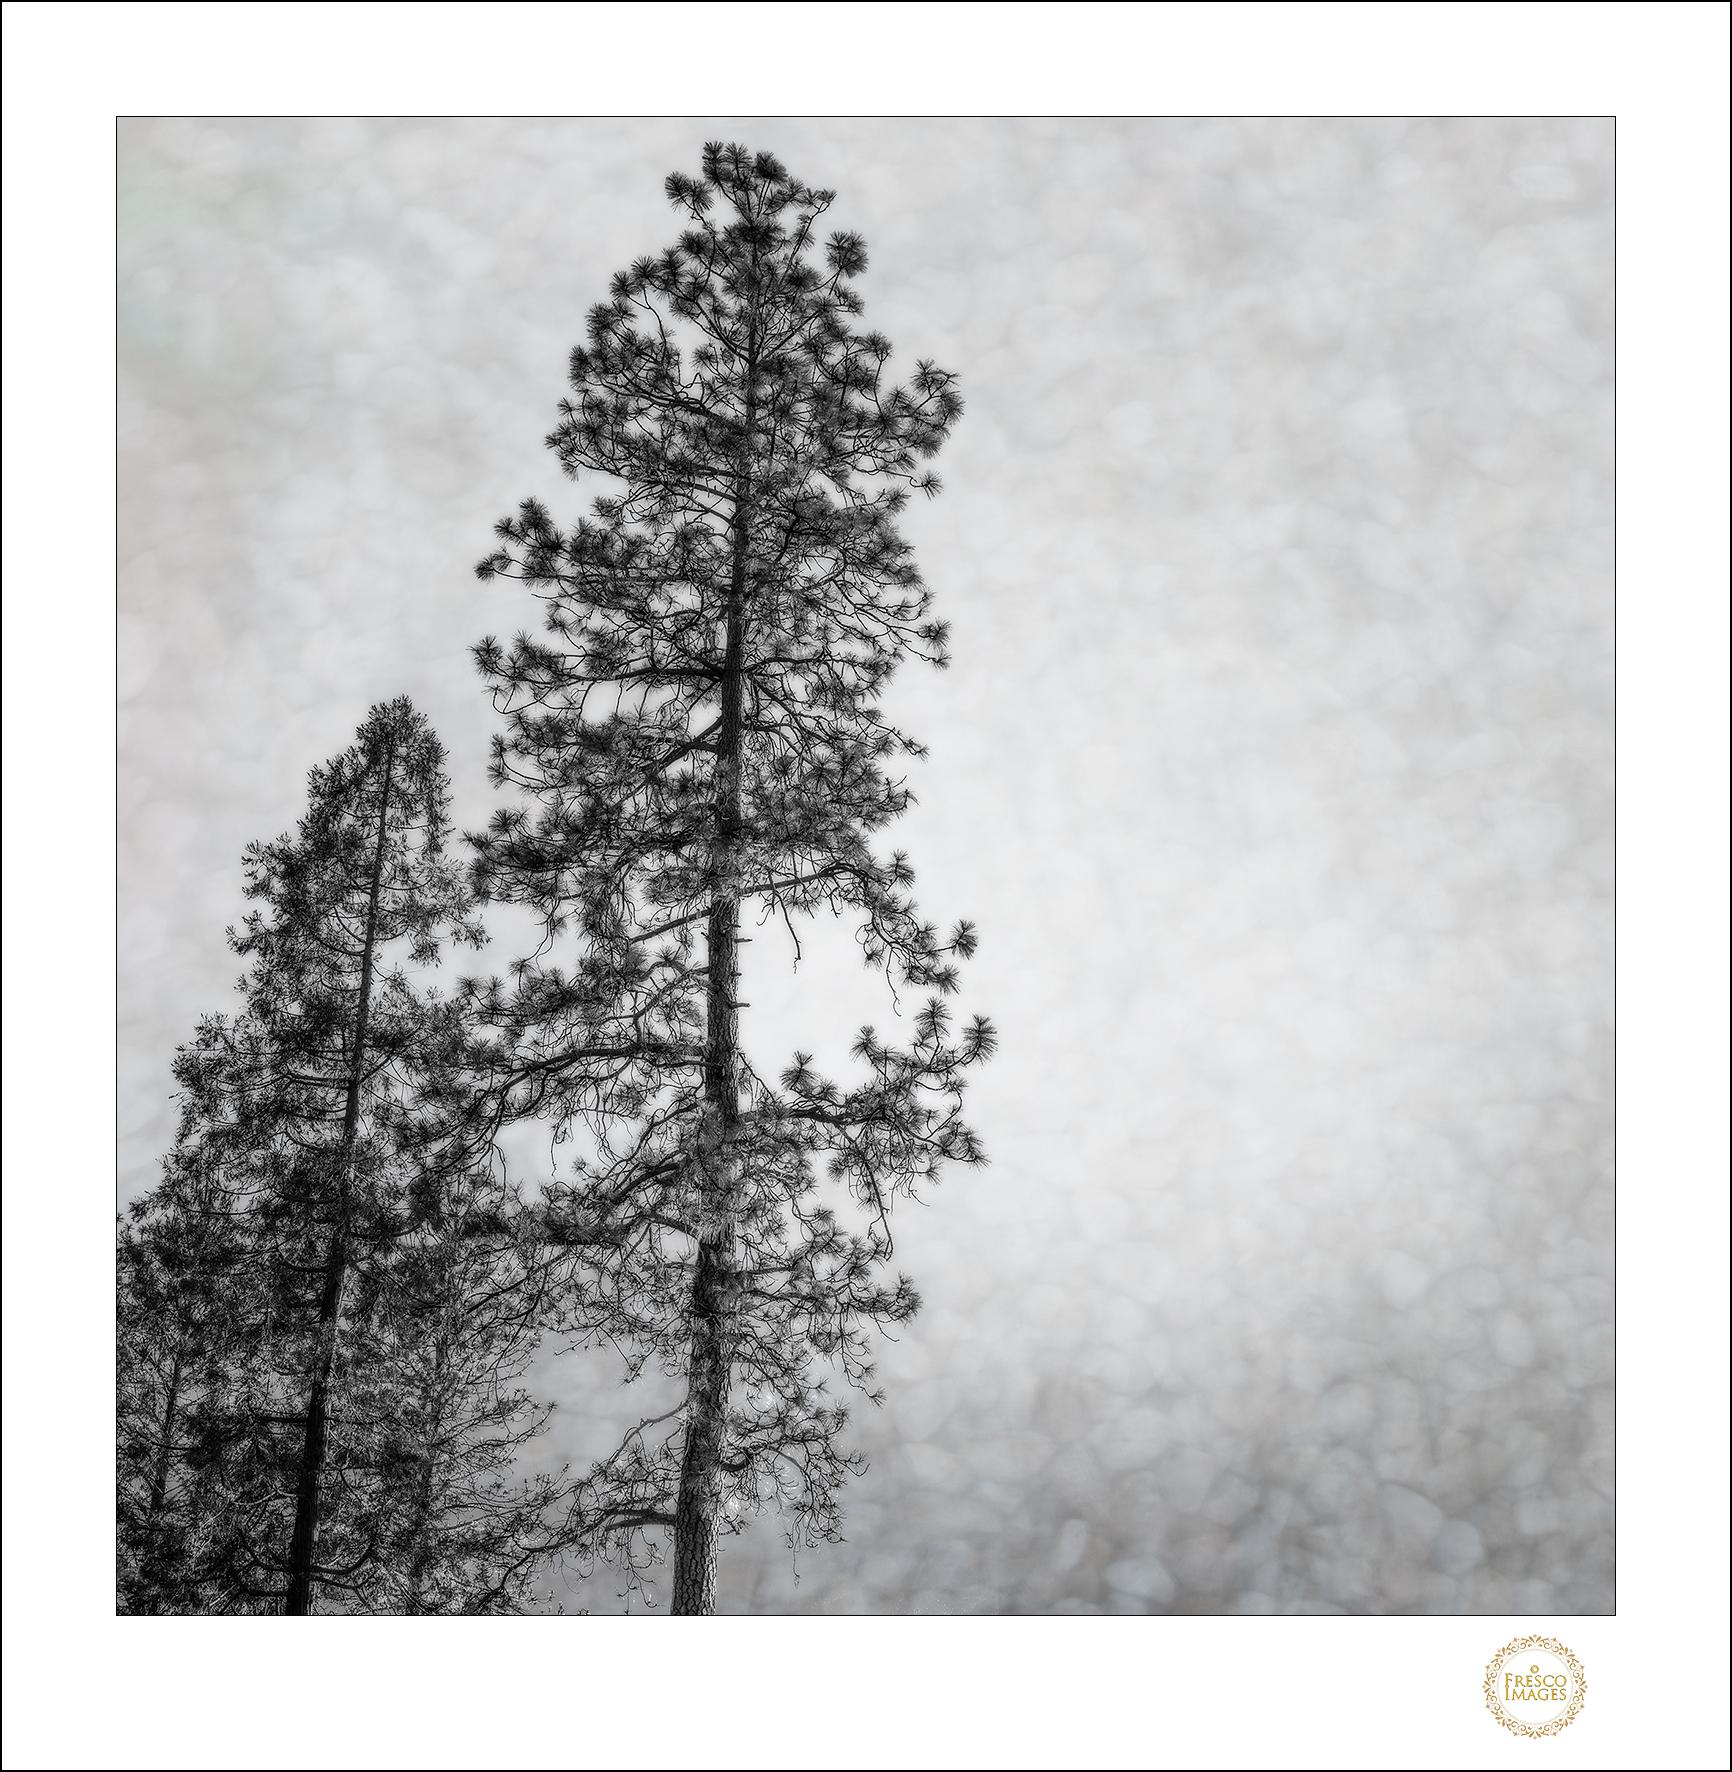 'Pines'